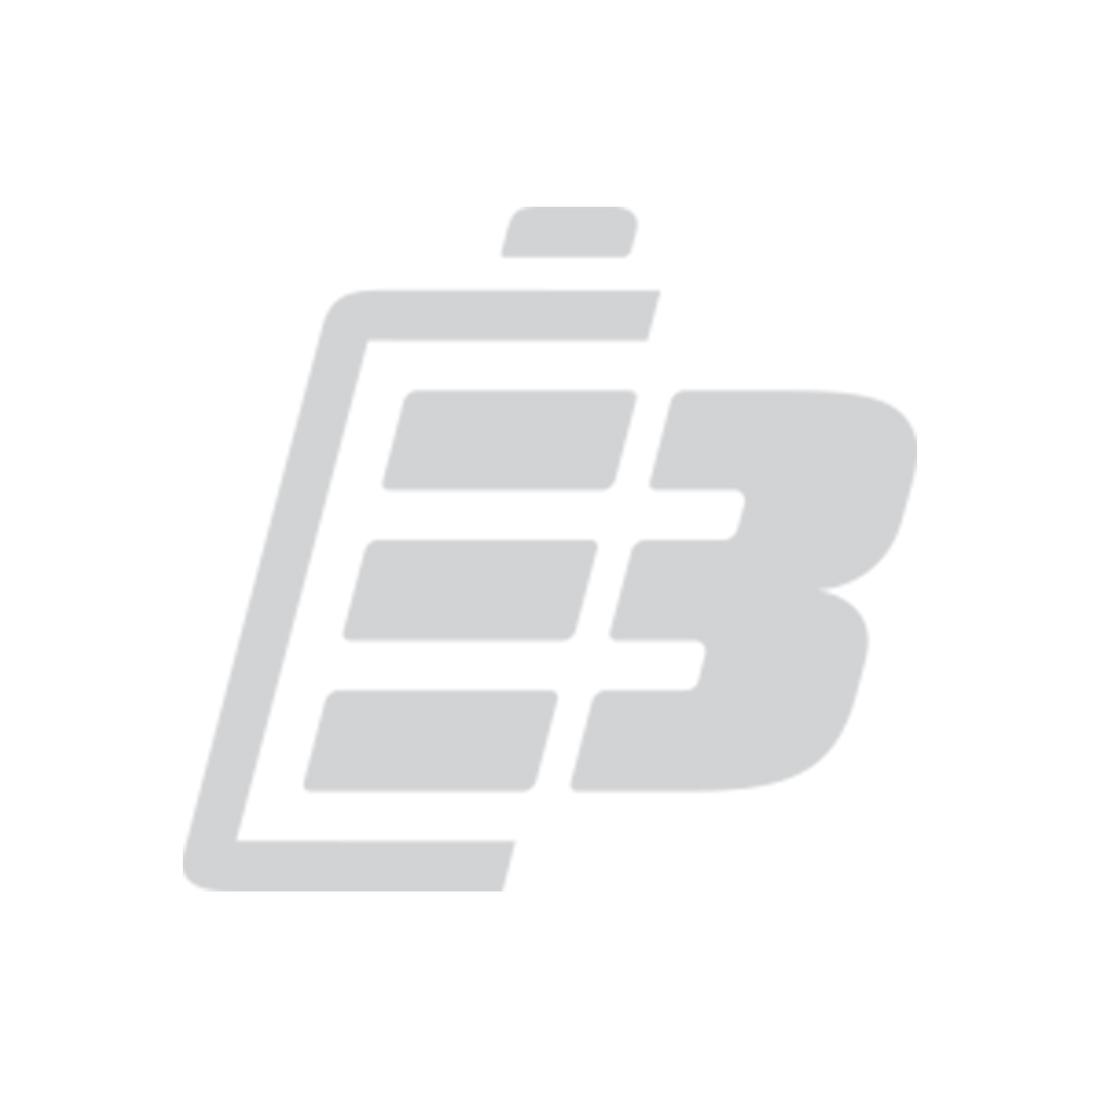 power tool battery makita 14 4v 4 0ah. Black Bedroom Furniture Sets. Home Design Ideas